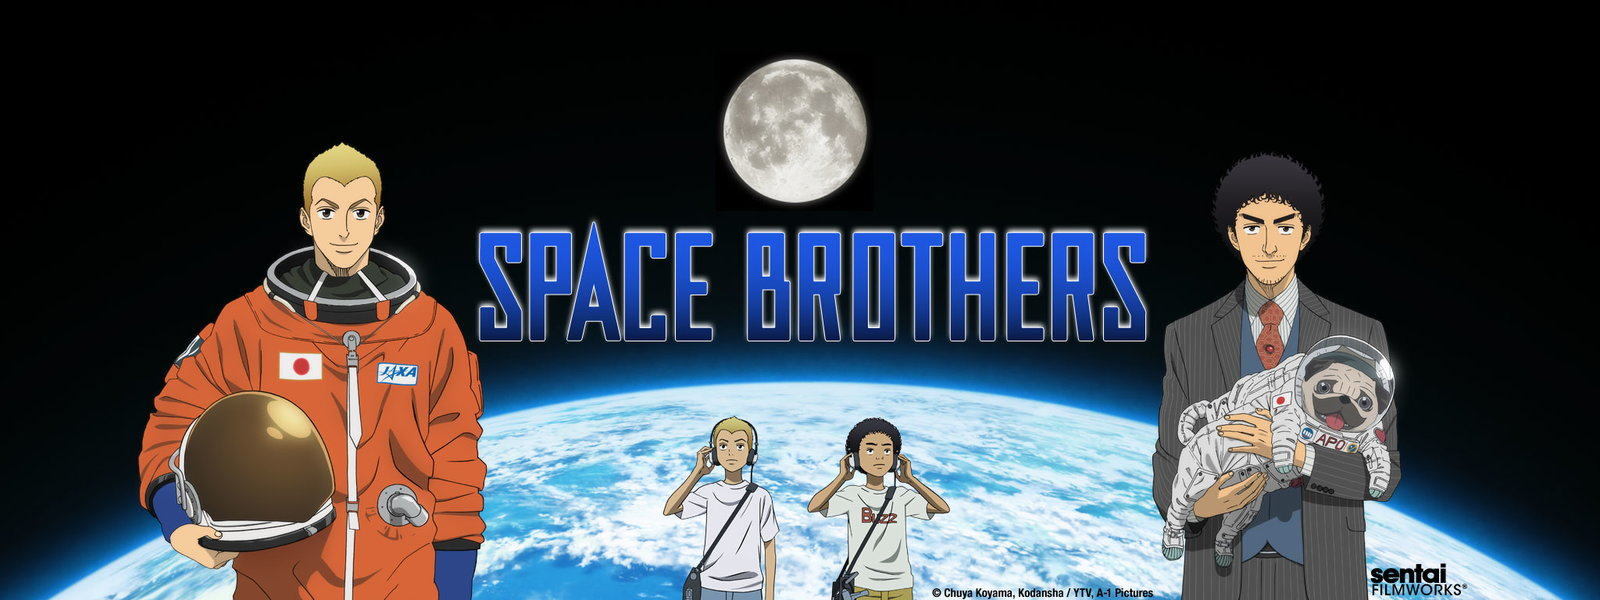 [ANIME/MANGA] Space Brothers (Uchuu Kyoudai) 20909?size=1600x600&region=US